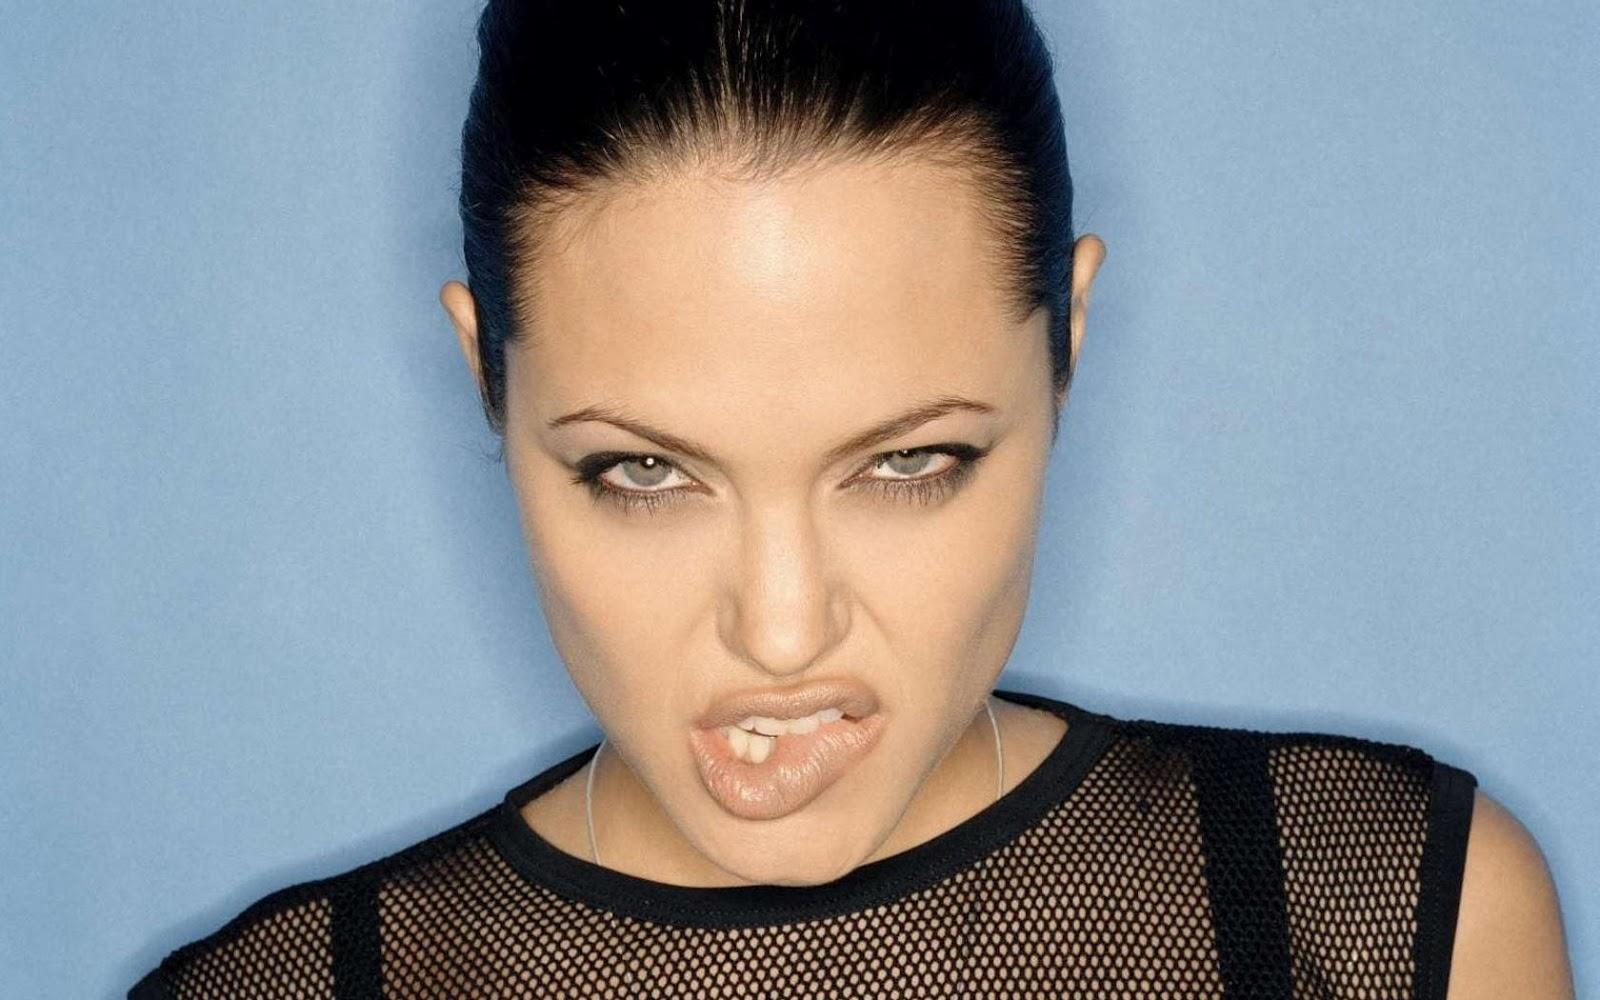 http://2.bp.blogspot.com/-pwvzppLGSdM/UCyigxIxdOI/AAAAAAAAB00/Zfp17XedRy0/s1600/Angelina-Jolie-sexy-sheer-biting-lip.jpg